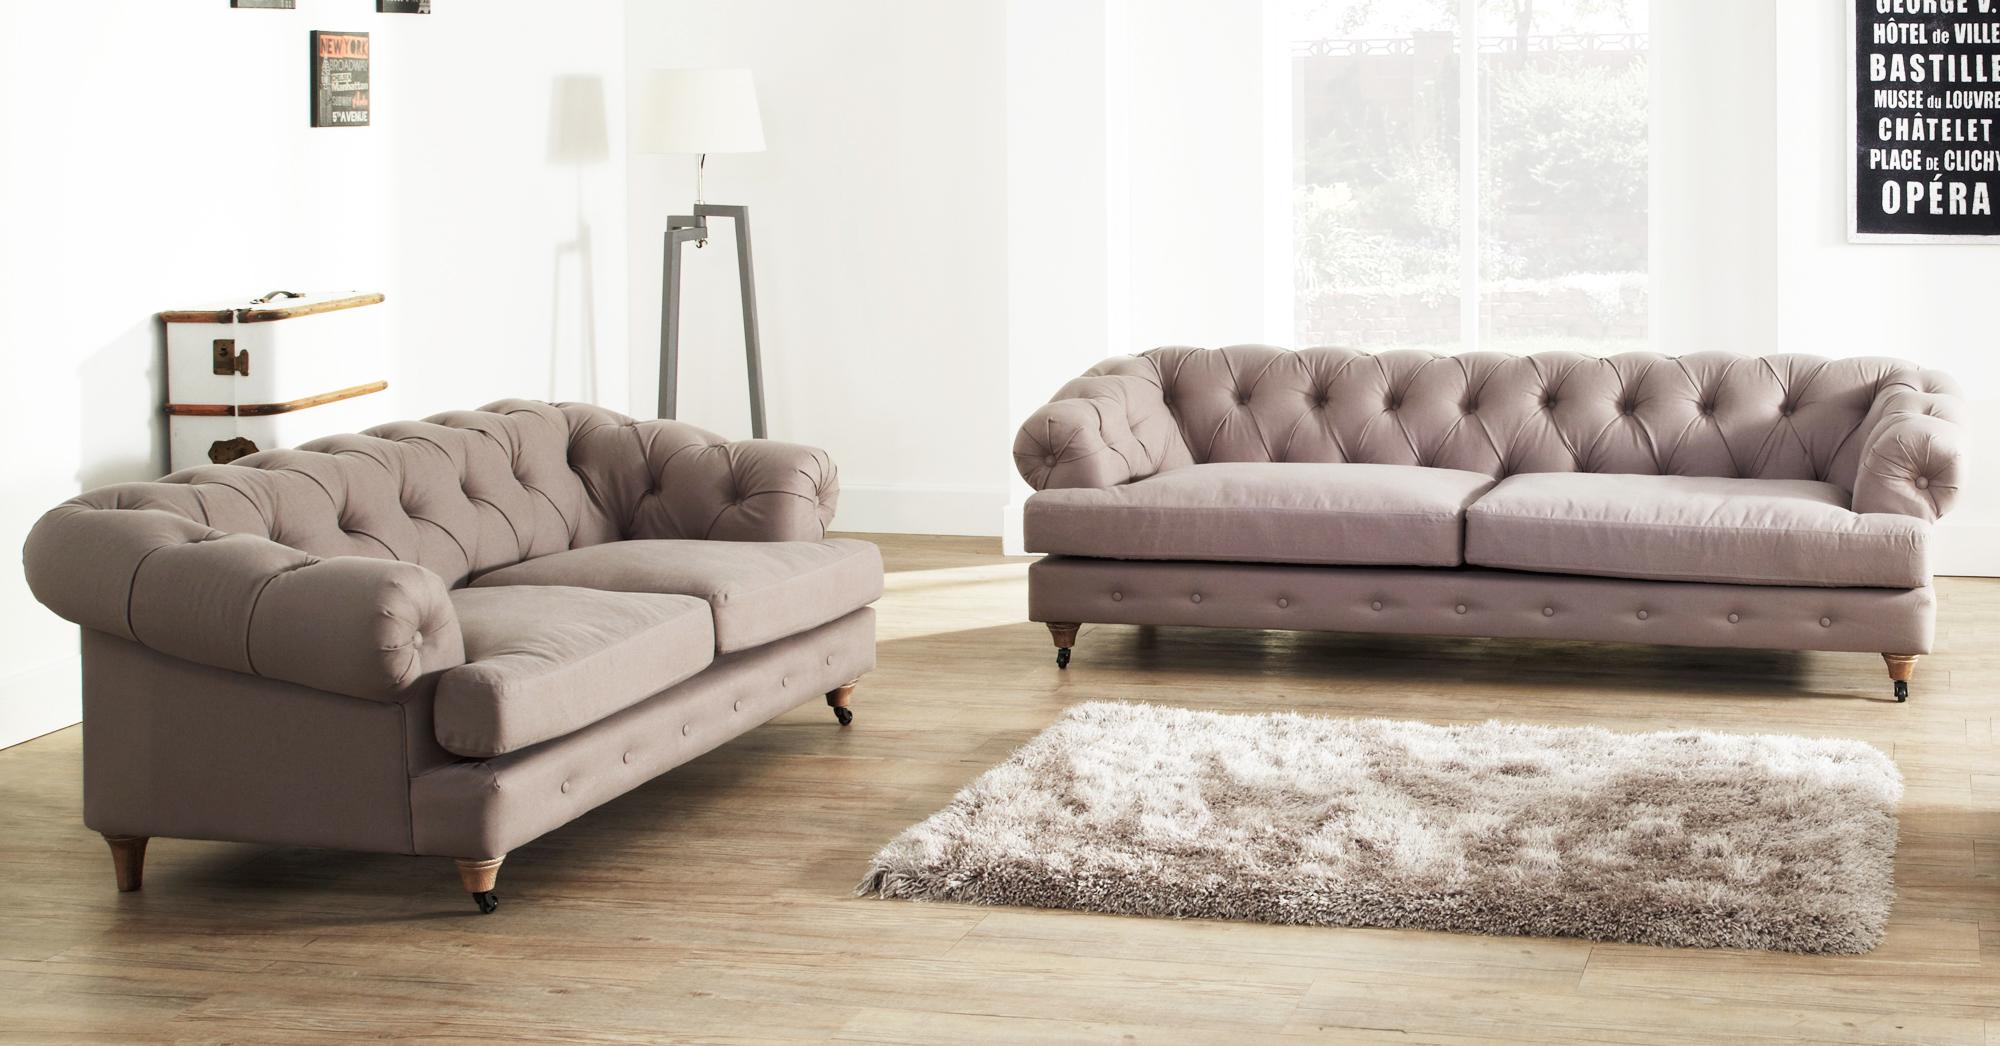 Home Sofa Chesterfield Sofa Linen